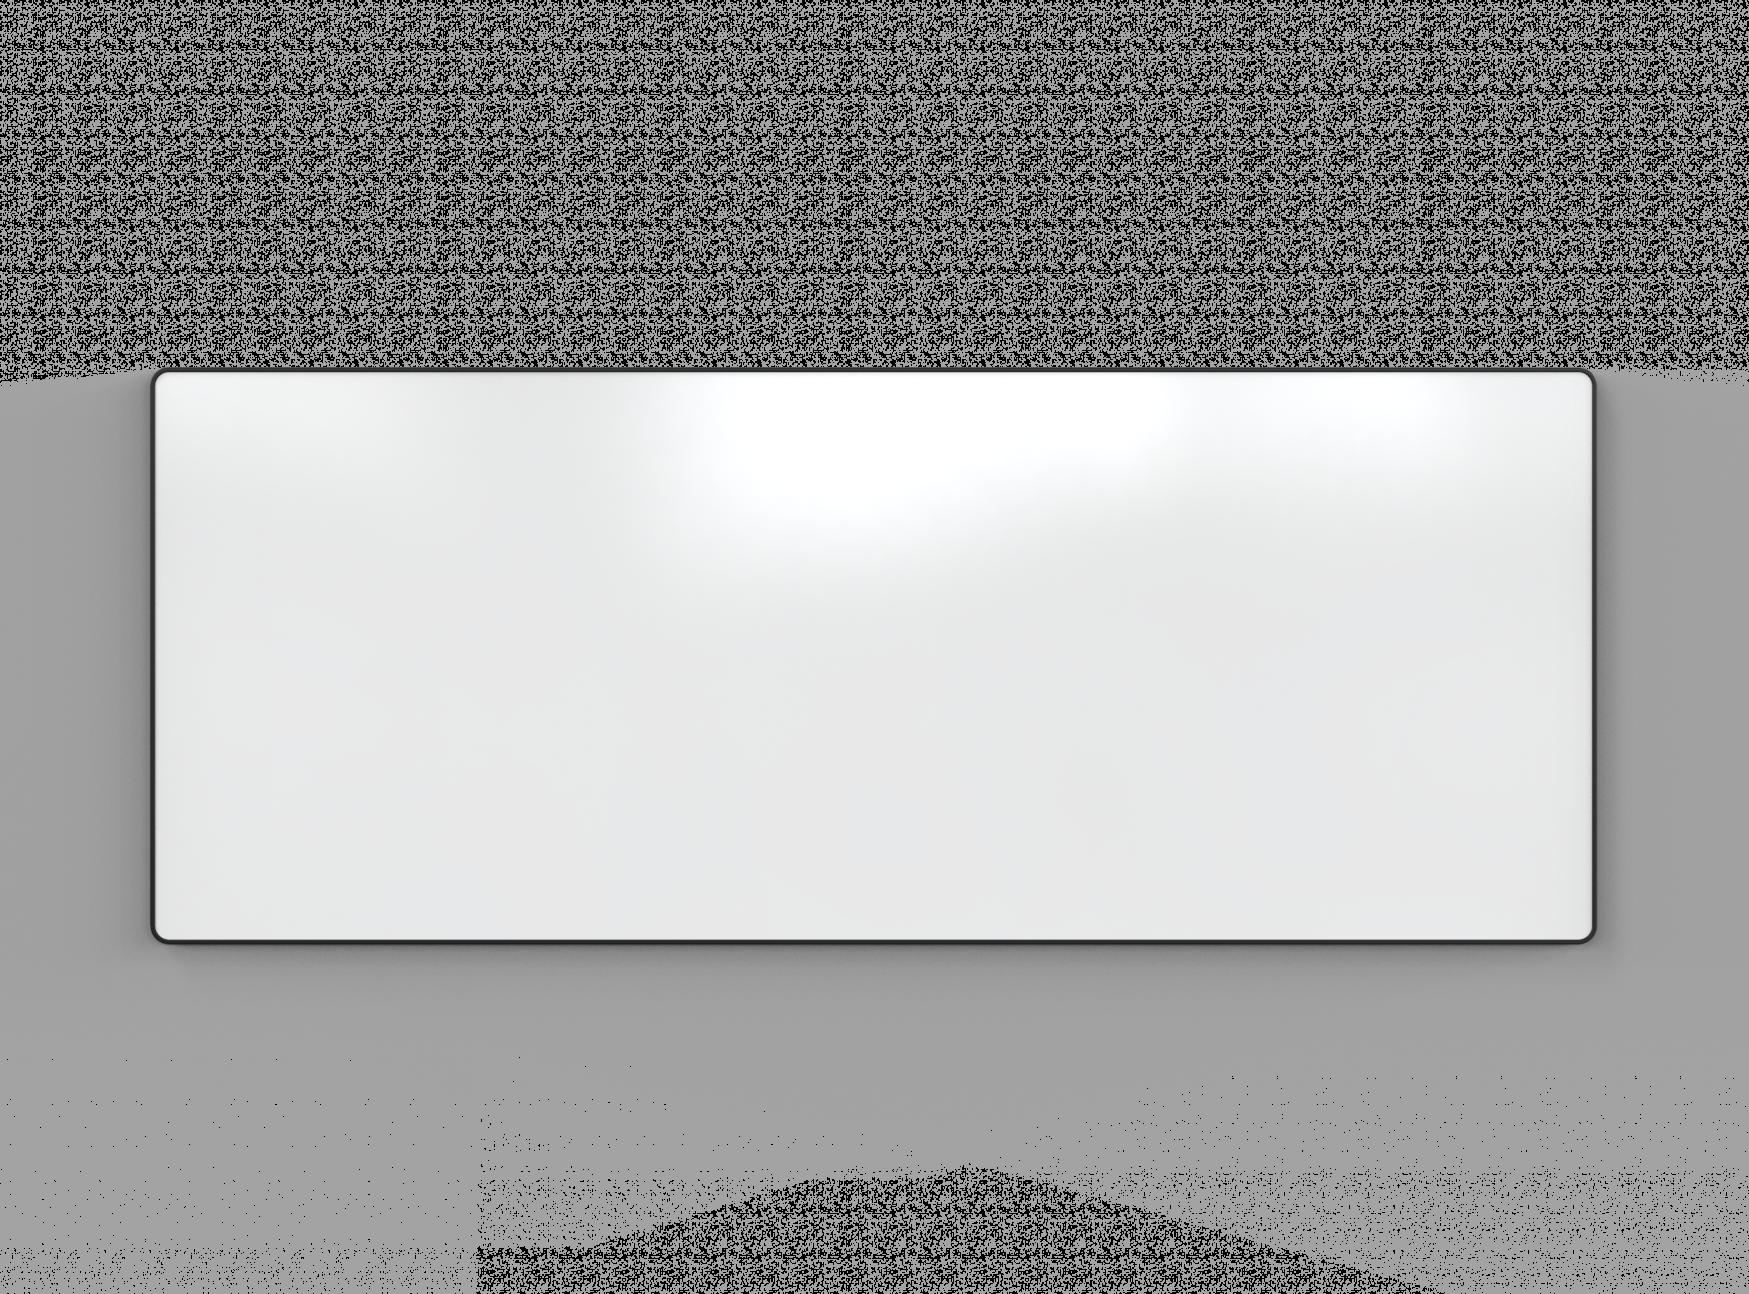 2995 x 1195